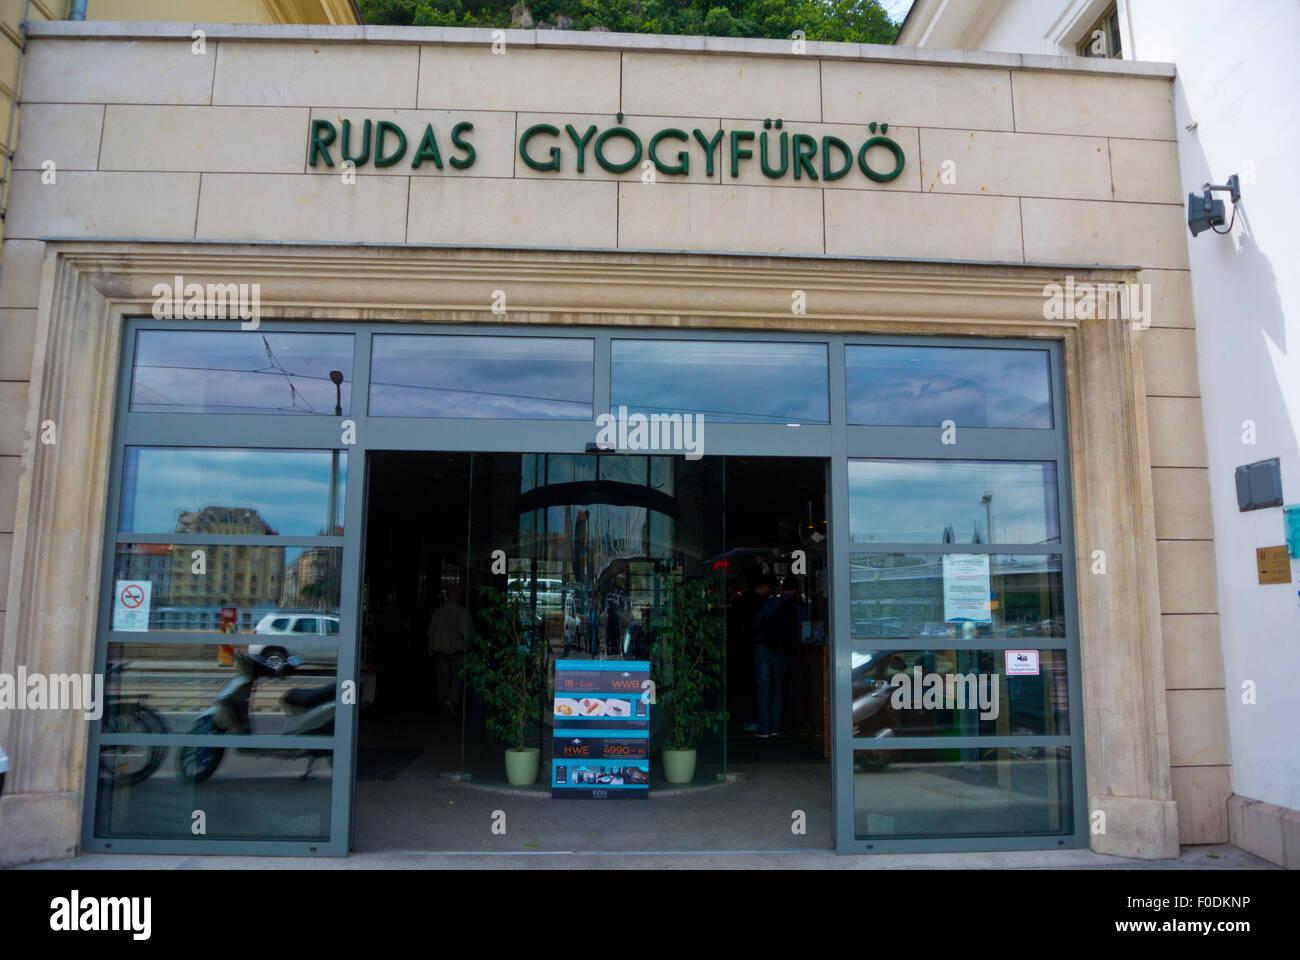 Rudas Gyogyfurdo, Rudas Mineral Baths, Buda, Budapest, Hungary, Europe - Stock Image